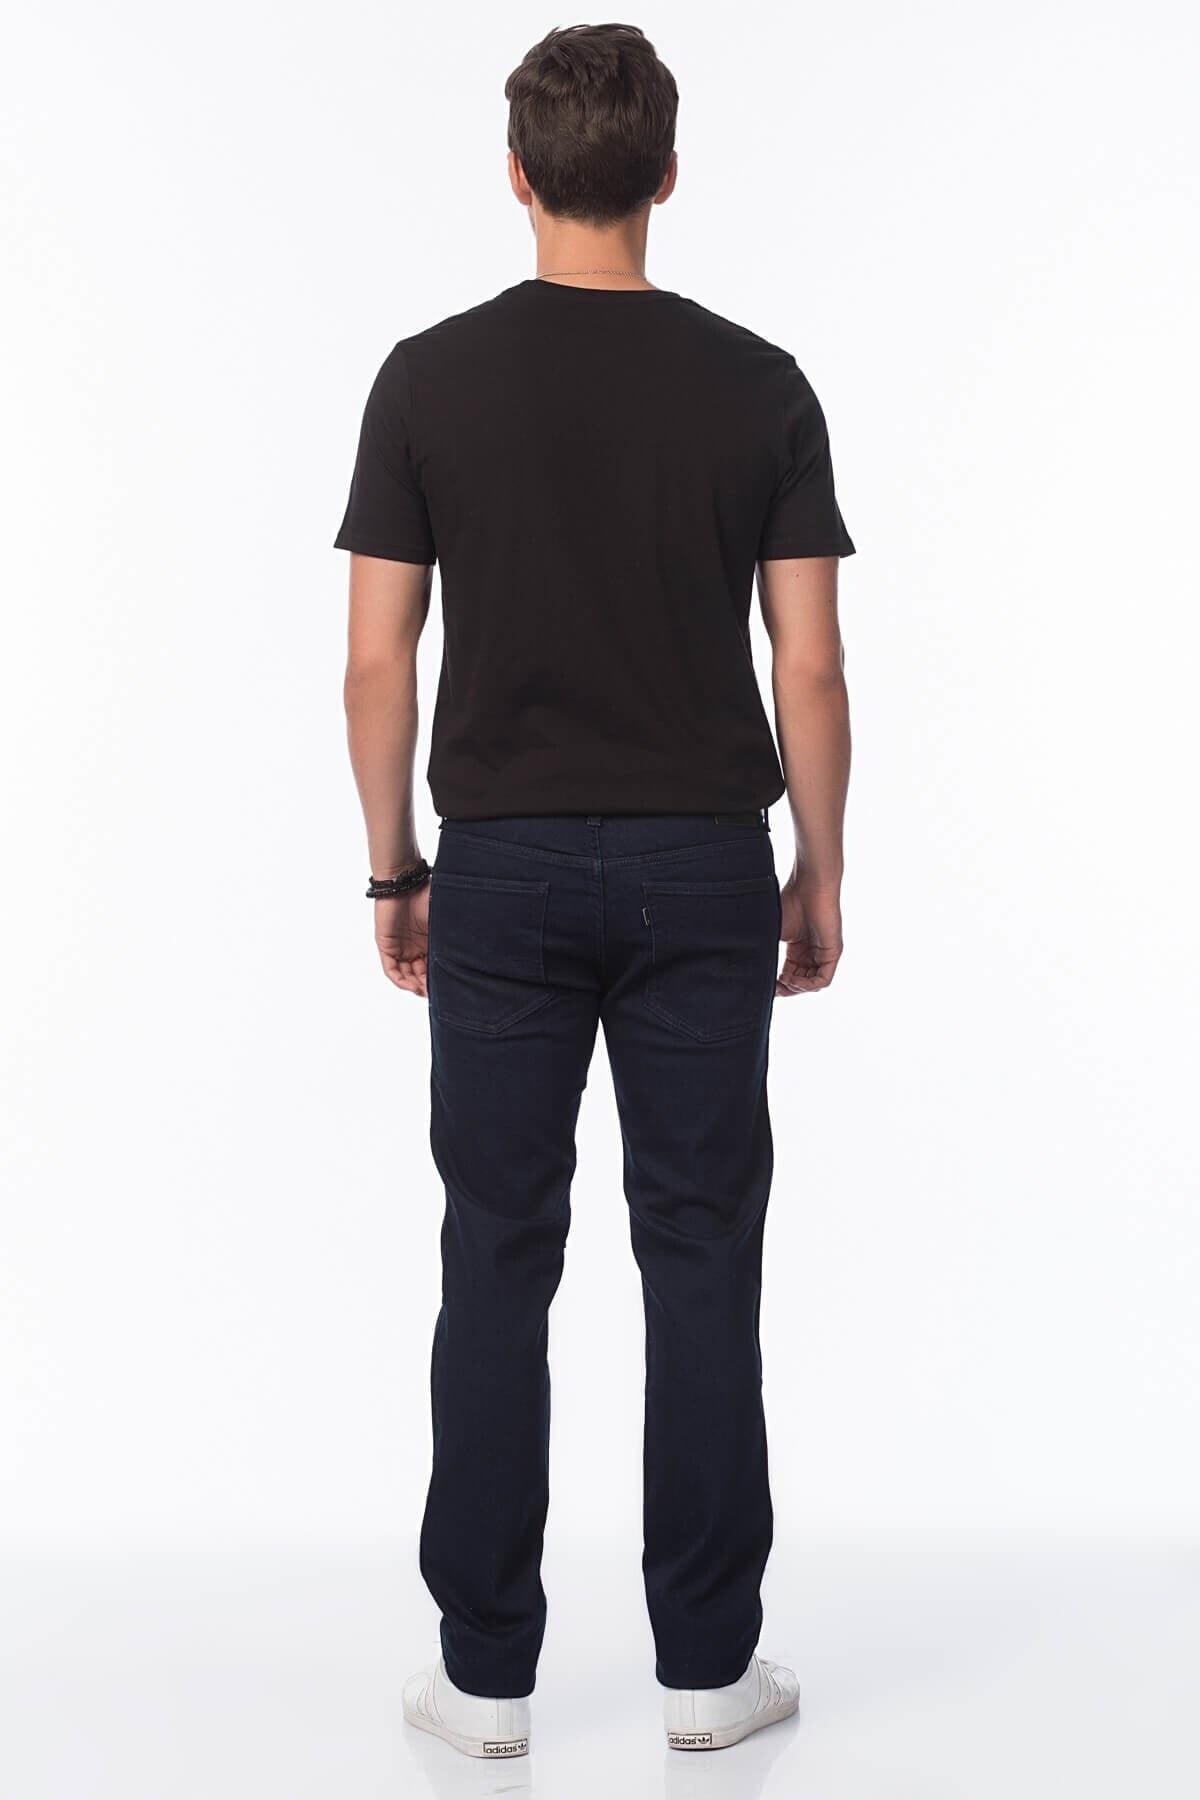 Levi's 511 L8 Slim Straight Erkek Jean Pantolon 29923-0016 2